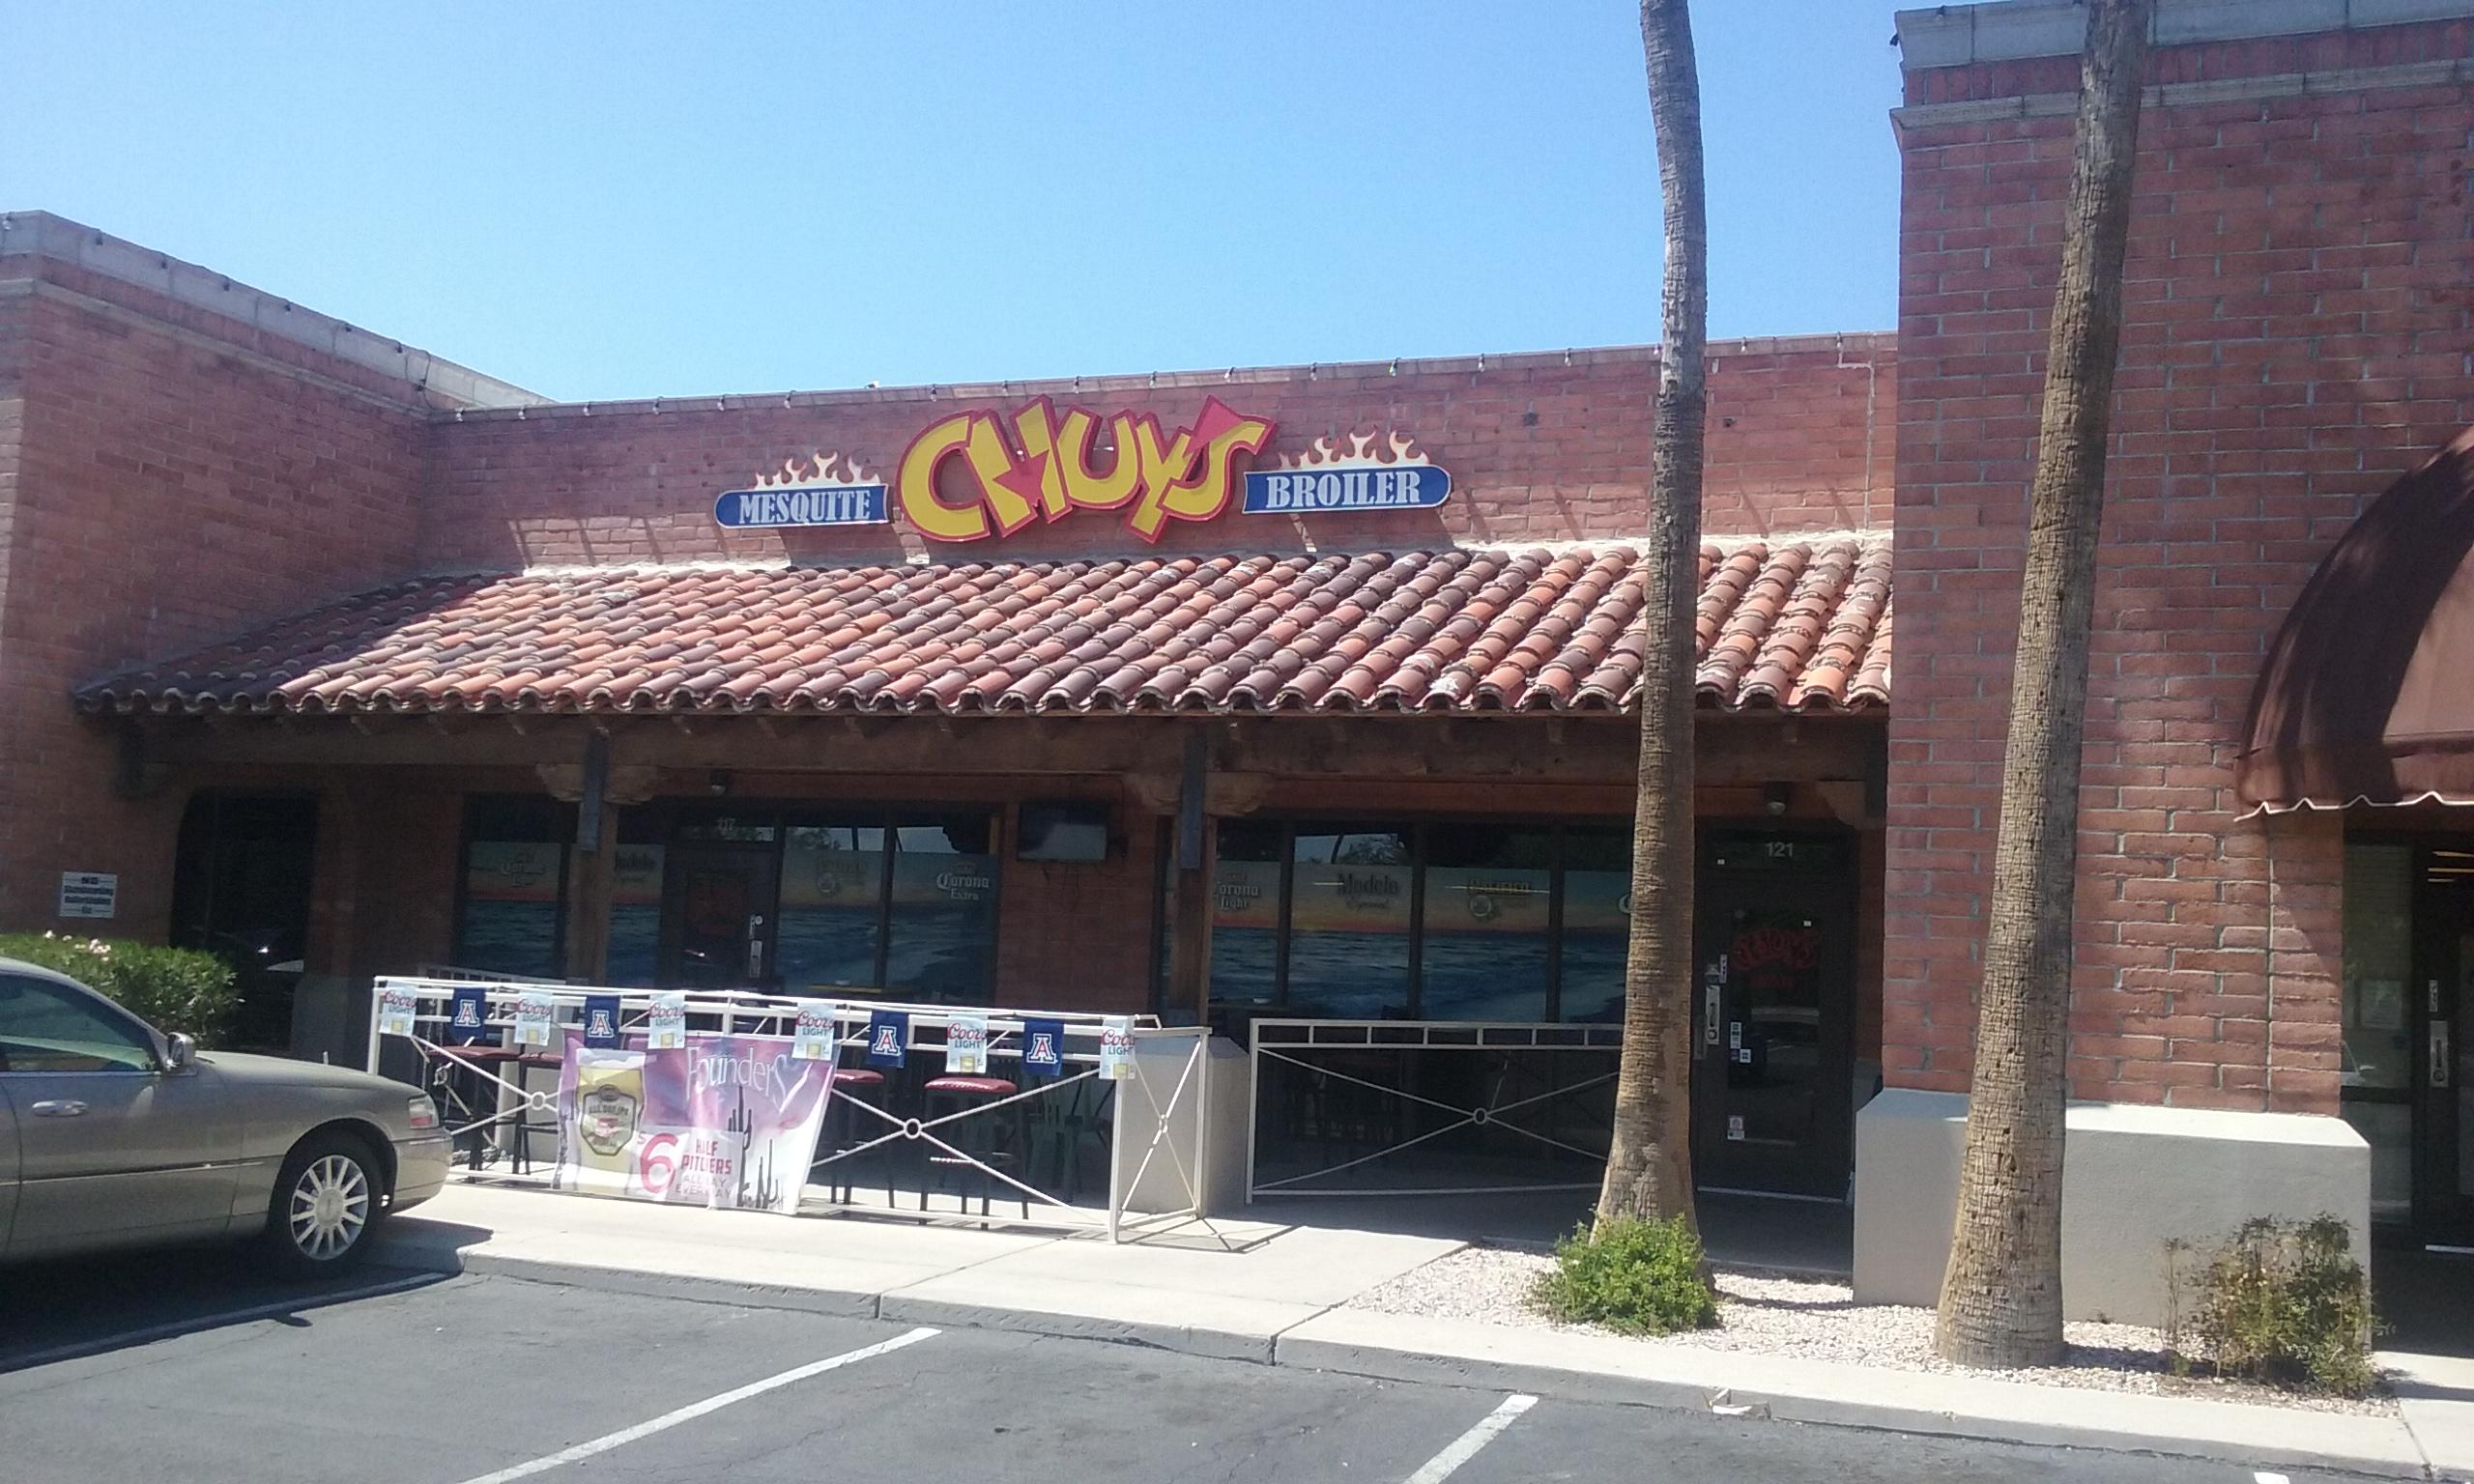 Chuy's Mesquite Broiler - Marana image 0